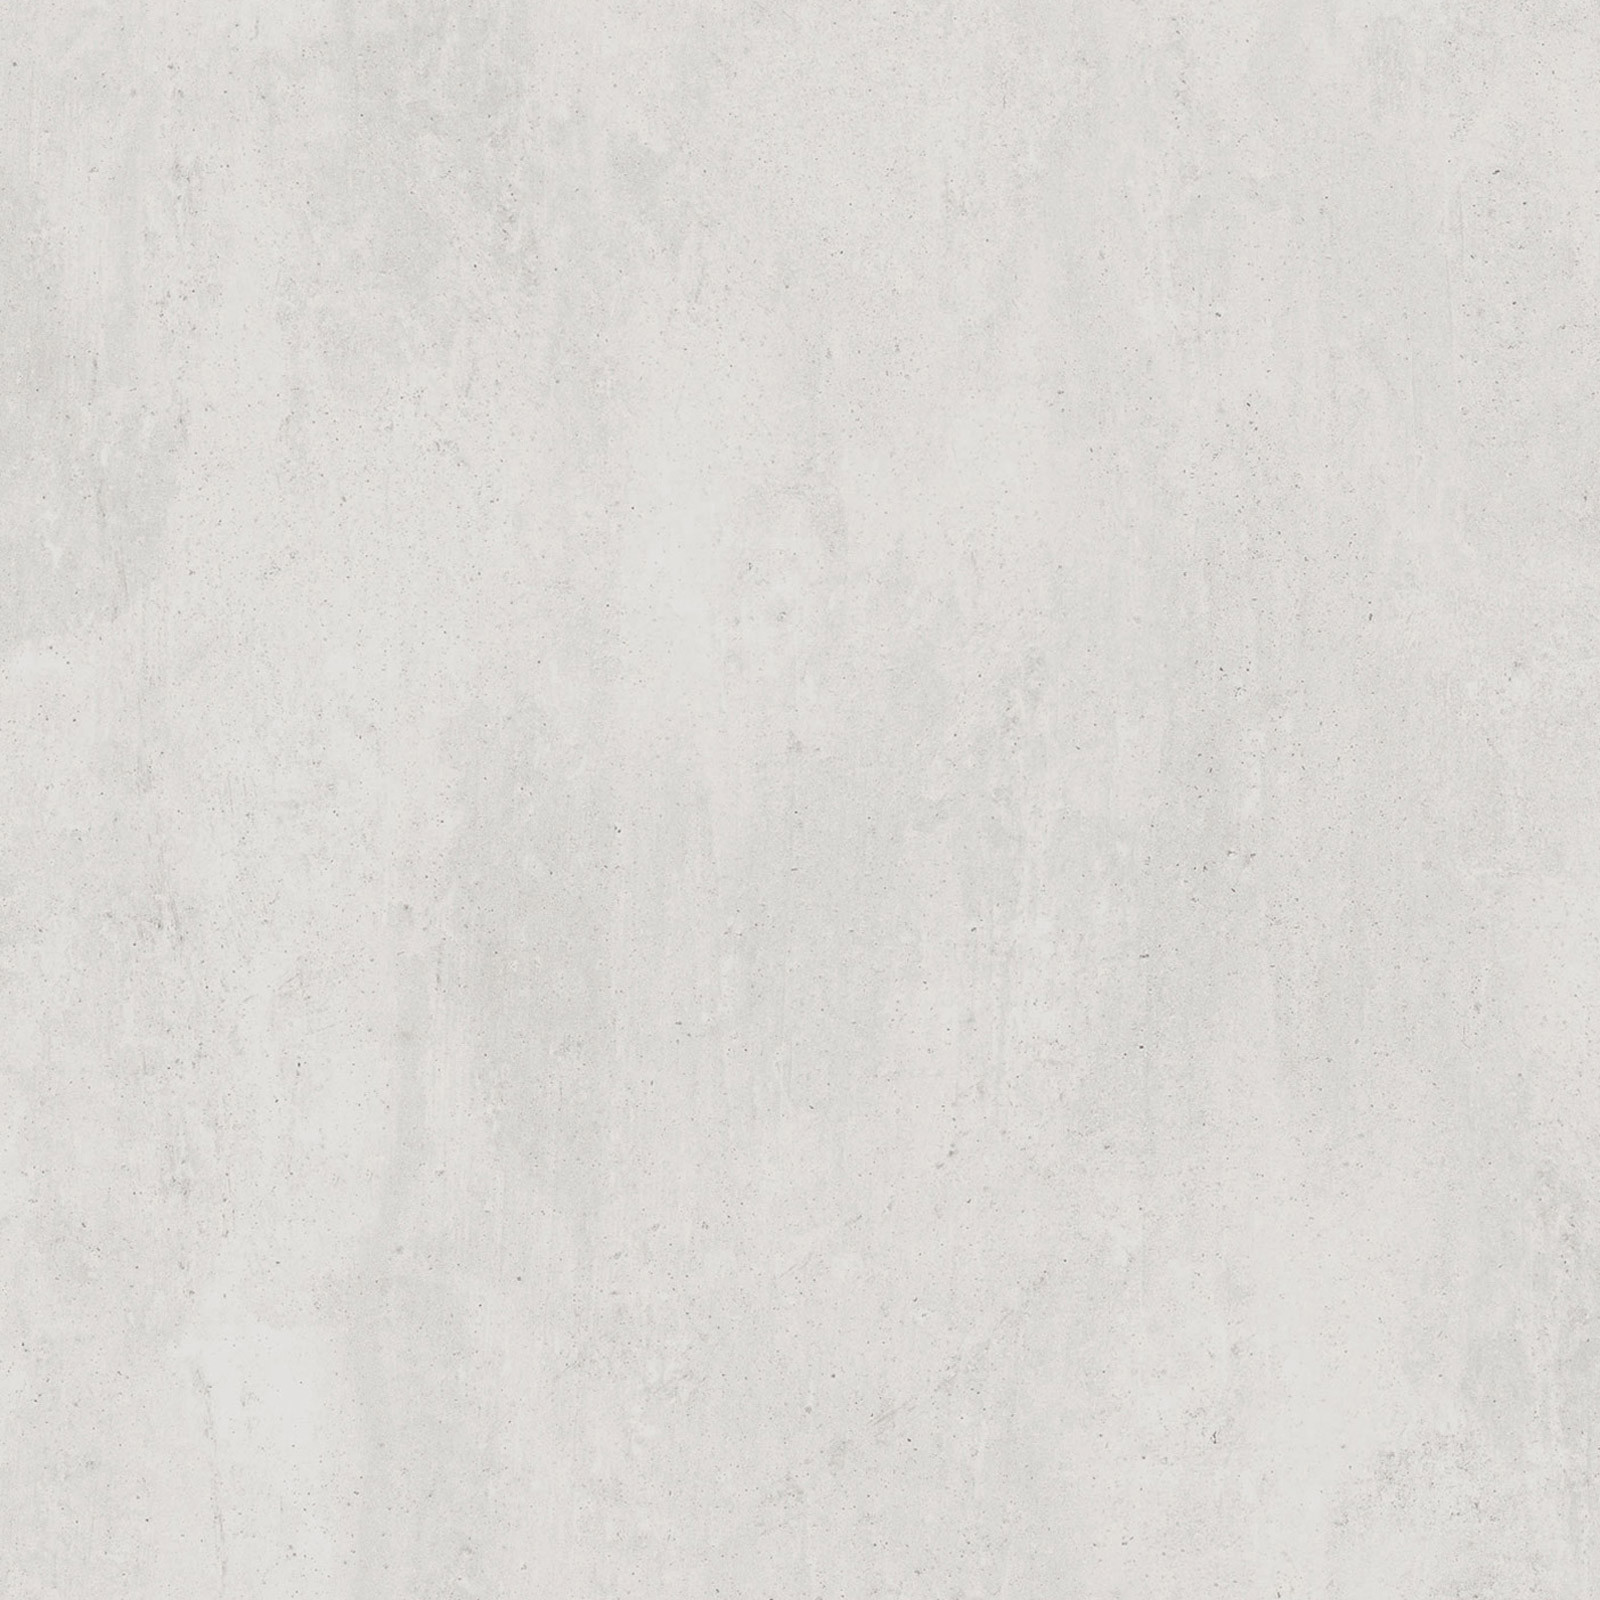 Cementi White Porcelain Wall Floor Tile